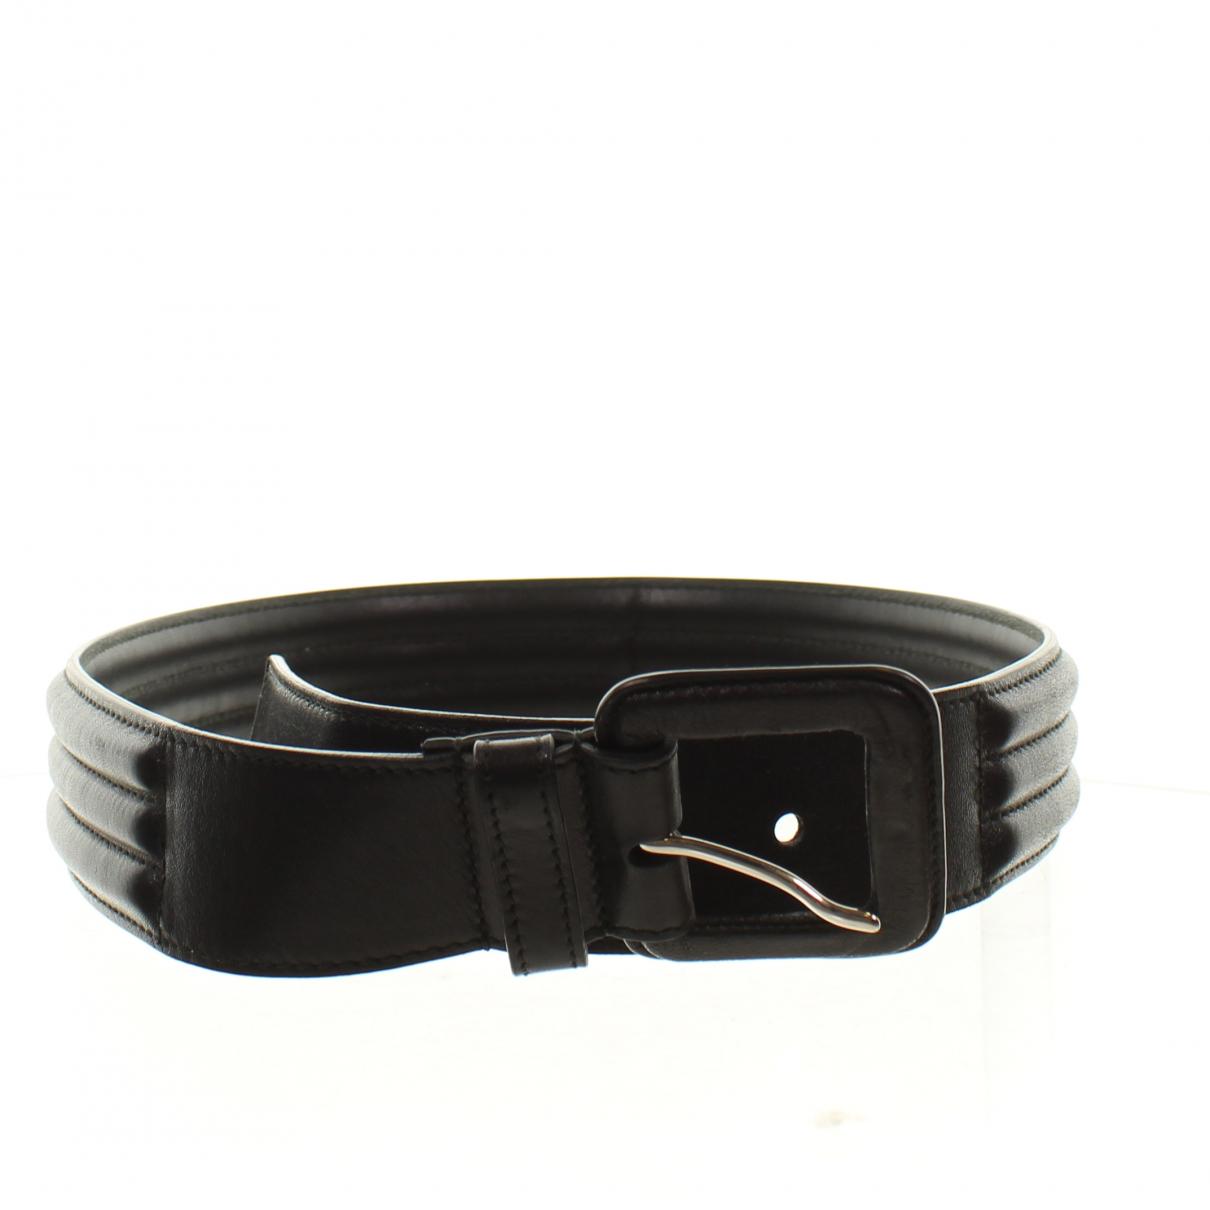 Yves Saint Laurent \N Black Leather belt for Women 31 Inches